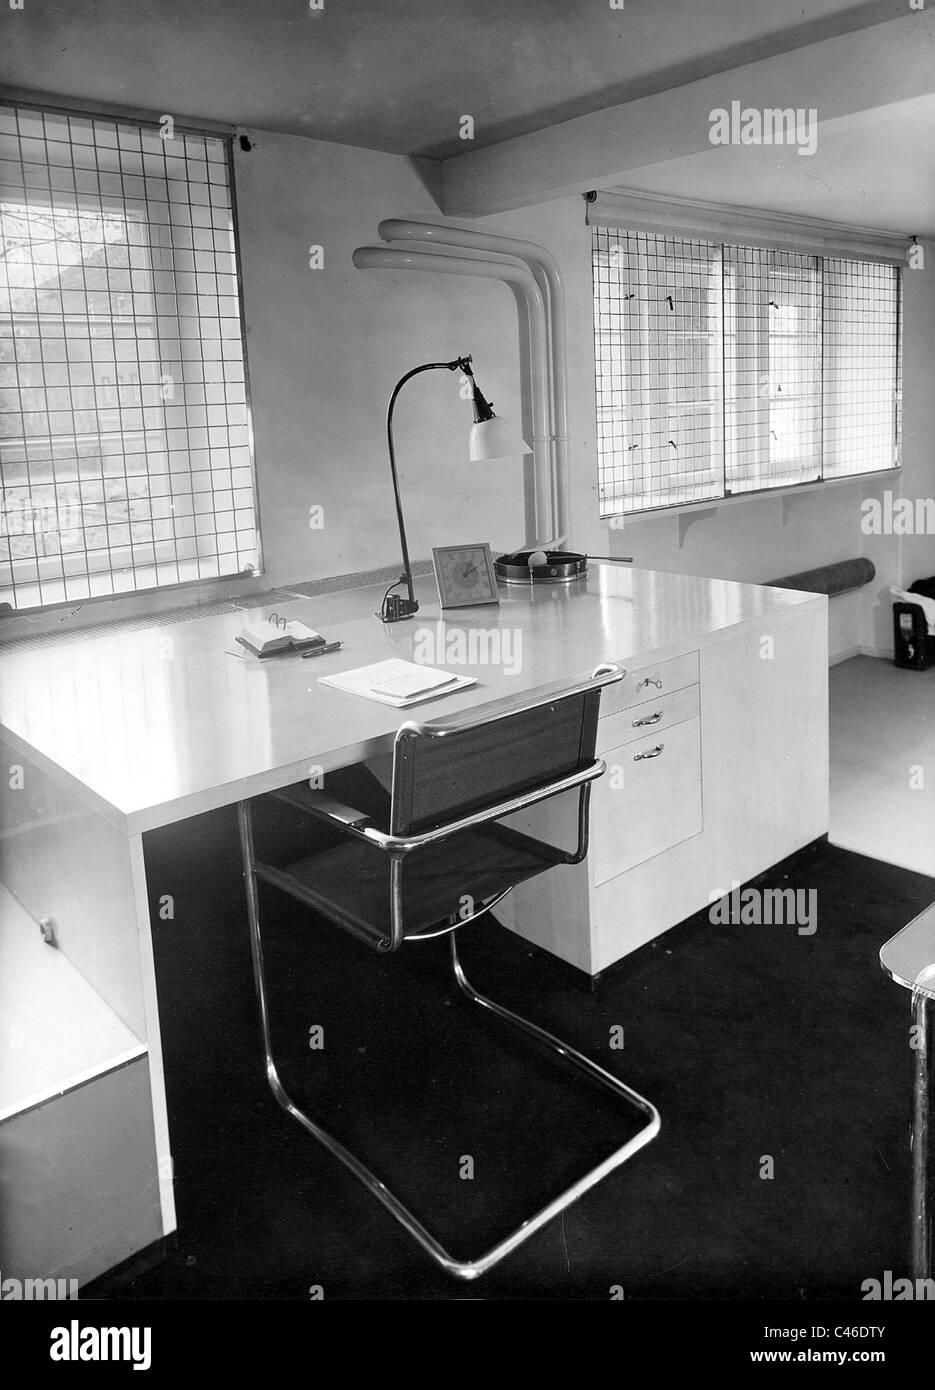 breuer stockfotos breuer bilder alamy. Black Bedroom Furniture Sets. Home Design Ideas